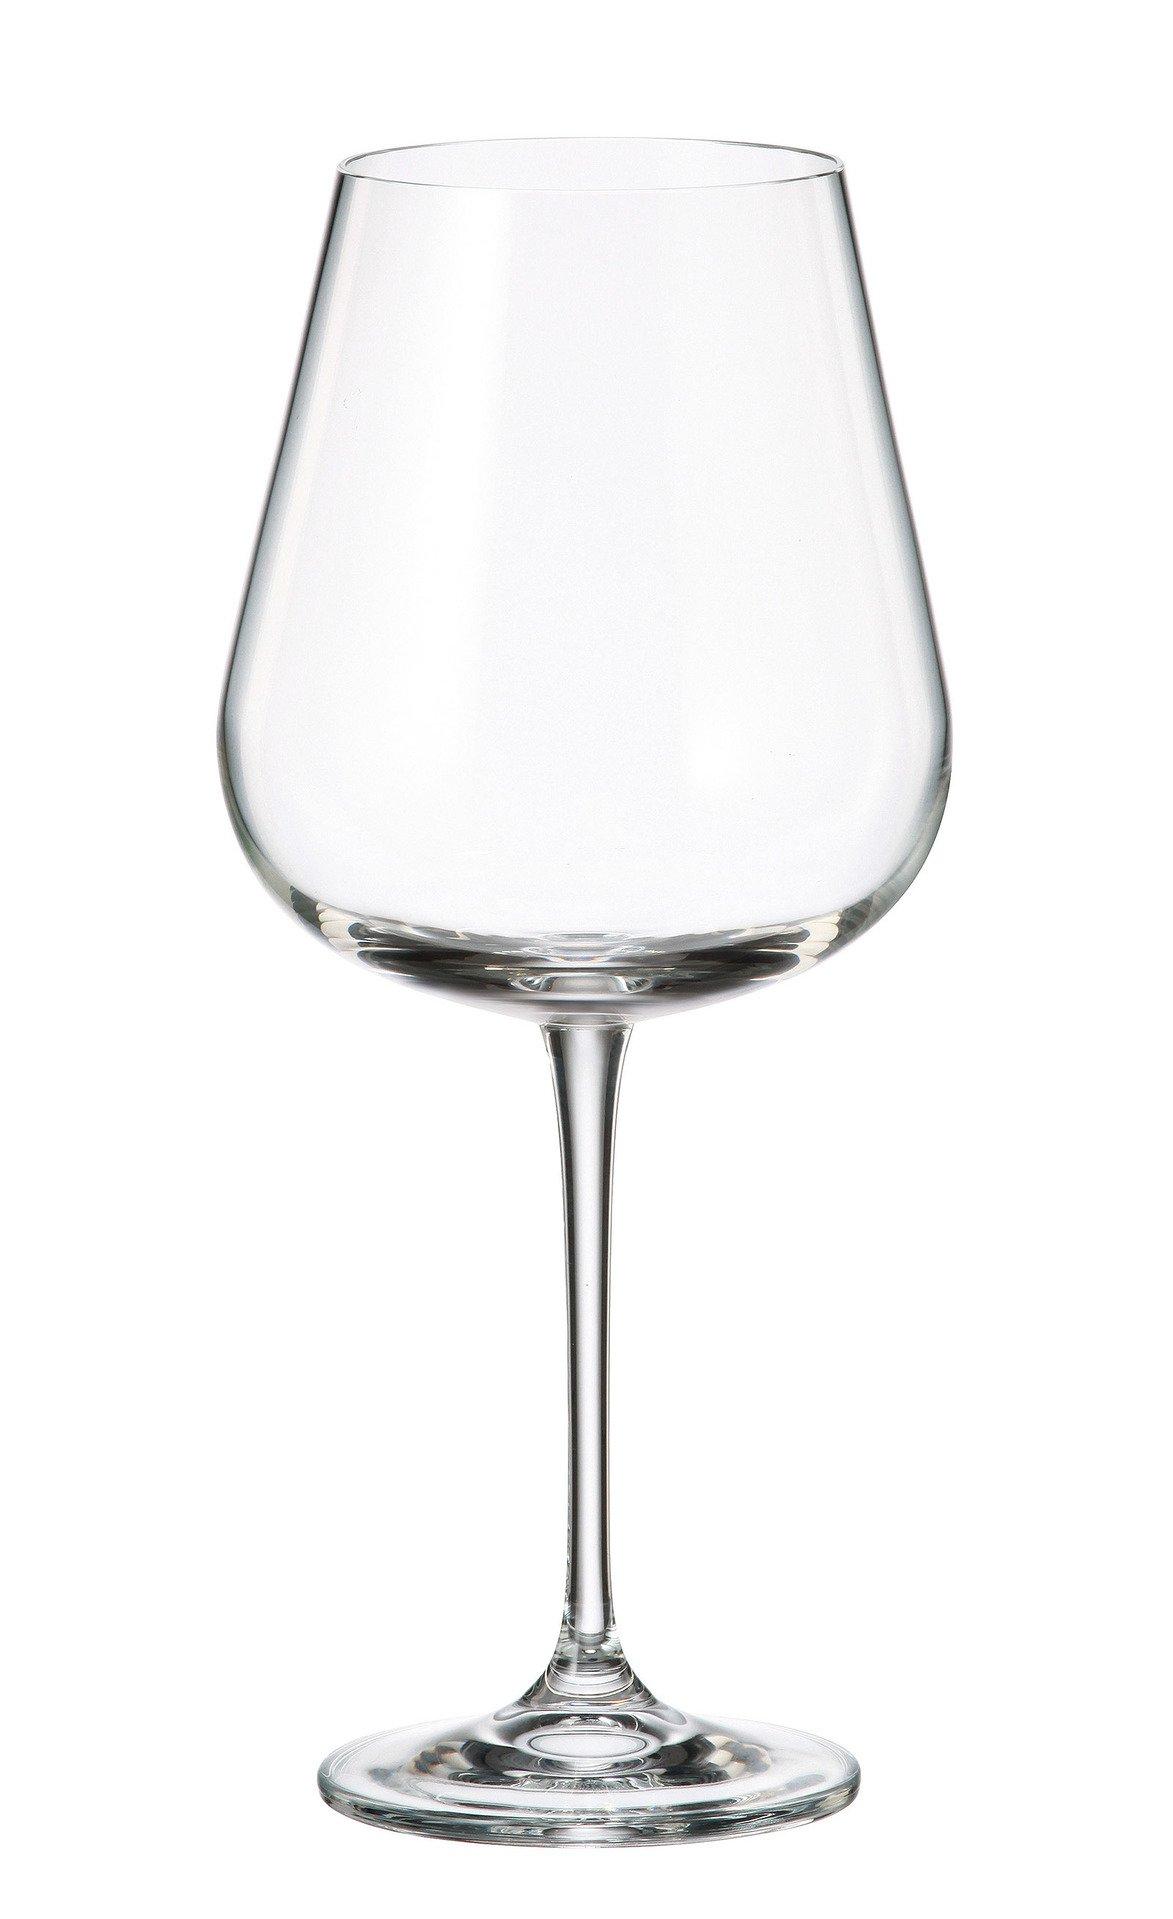 Crystalite Bohemia - Lead Free Crystal Wine Glasses Amundsen Stemware Collection, Set of 6 (Large Wine Glass 22oz. (670ml))